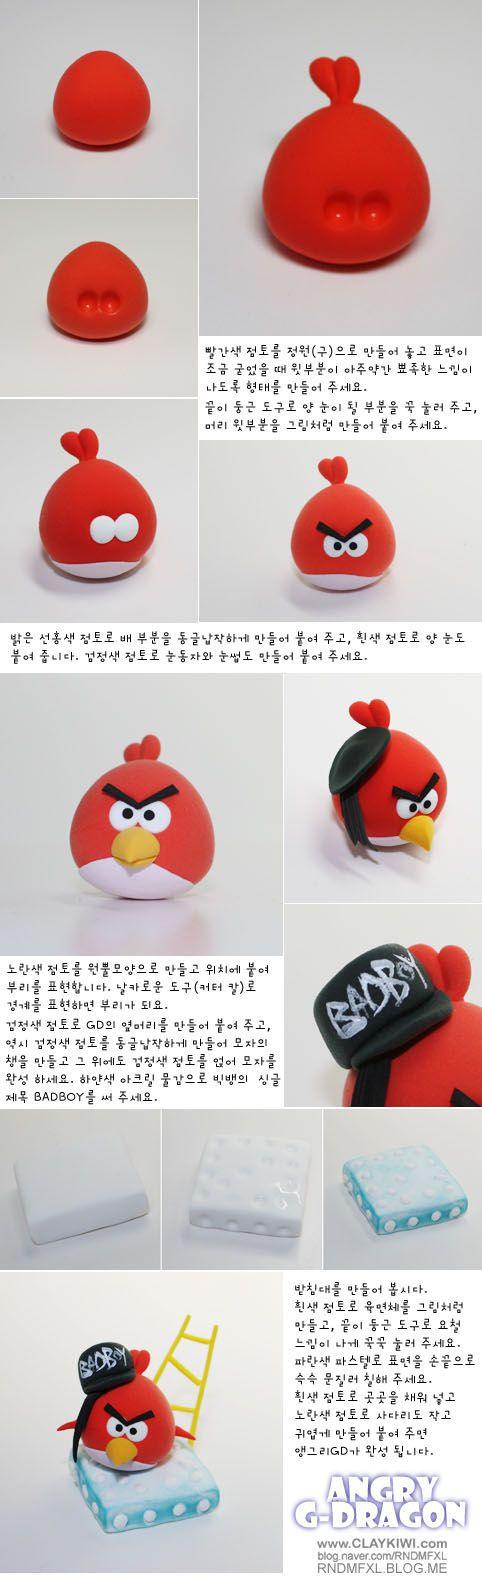 Angry G - Dragon - parody characters 4 :: Naver blog